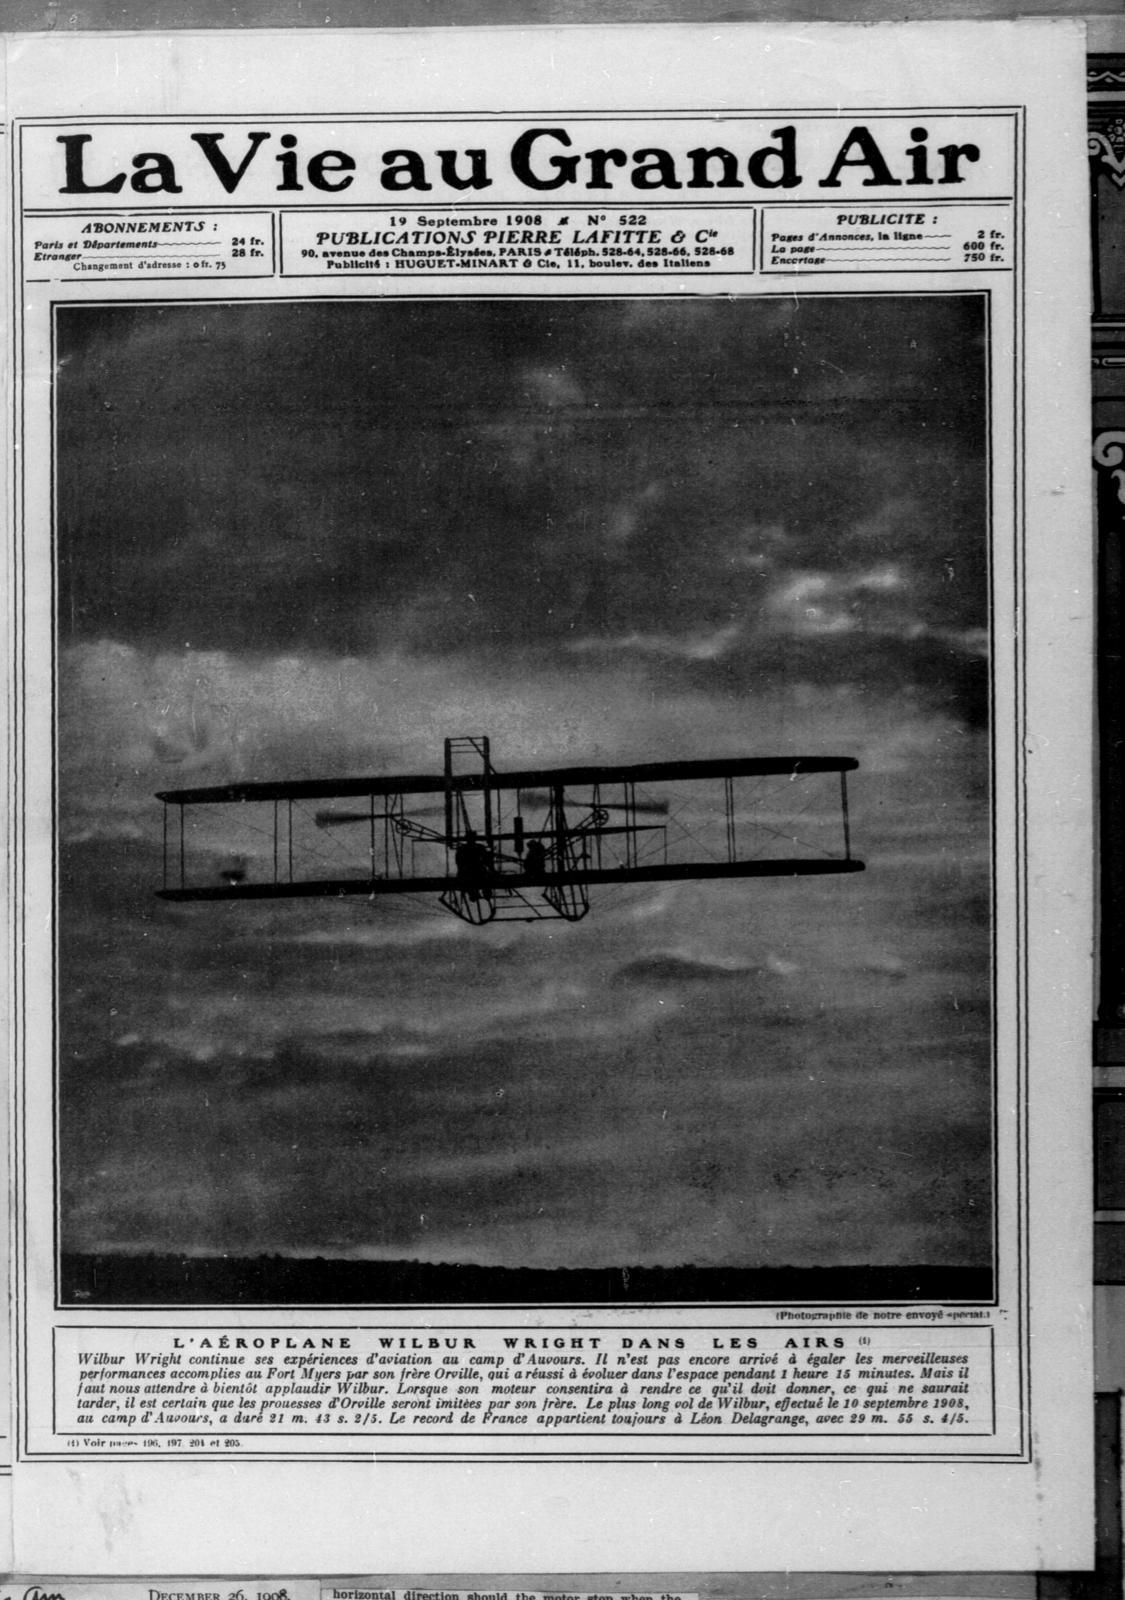 La Vie au Grand Air [19 September 1908]